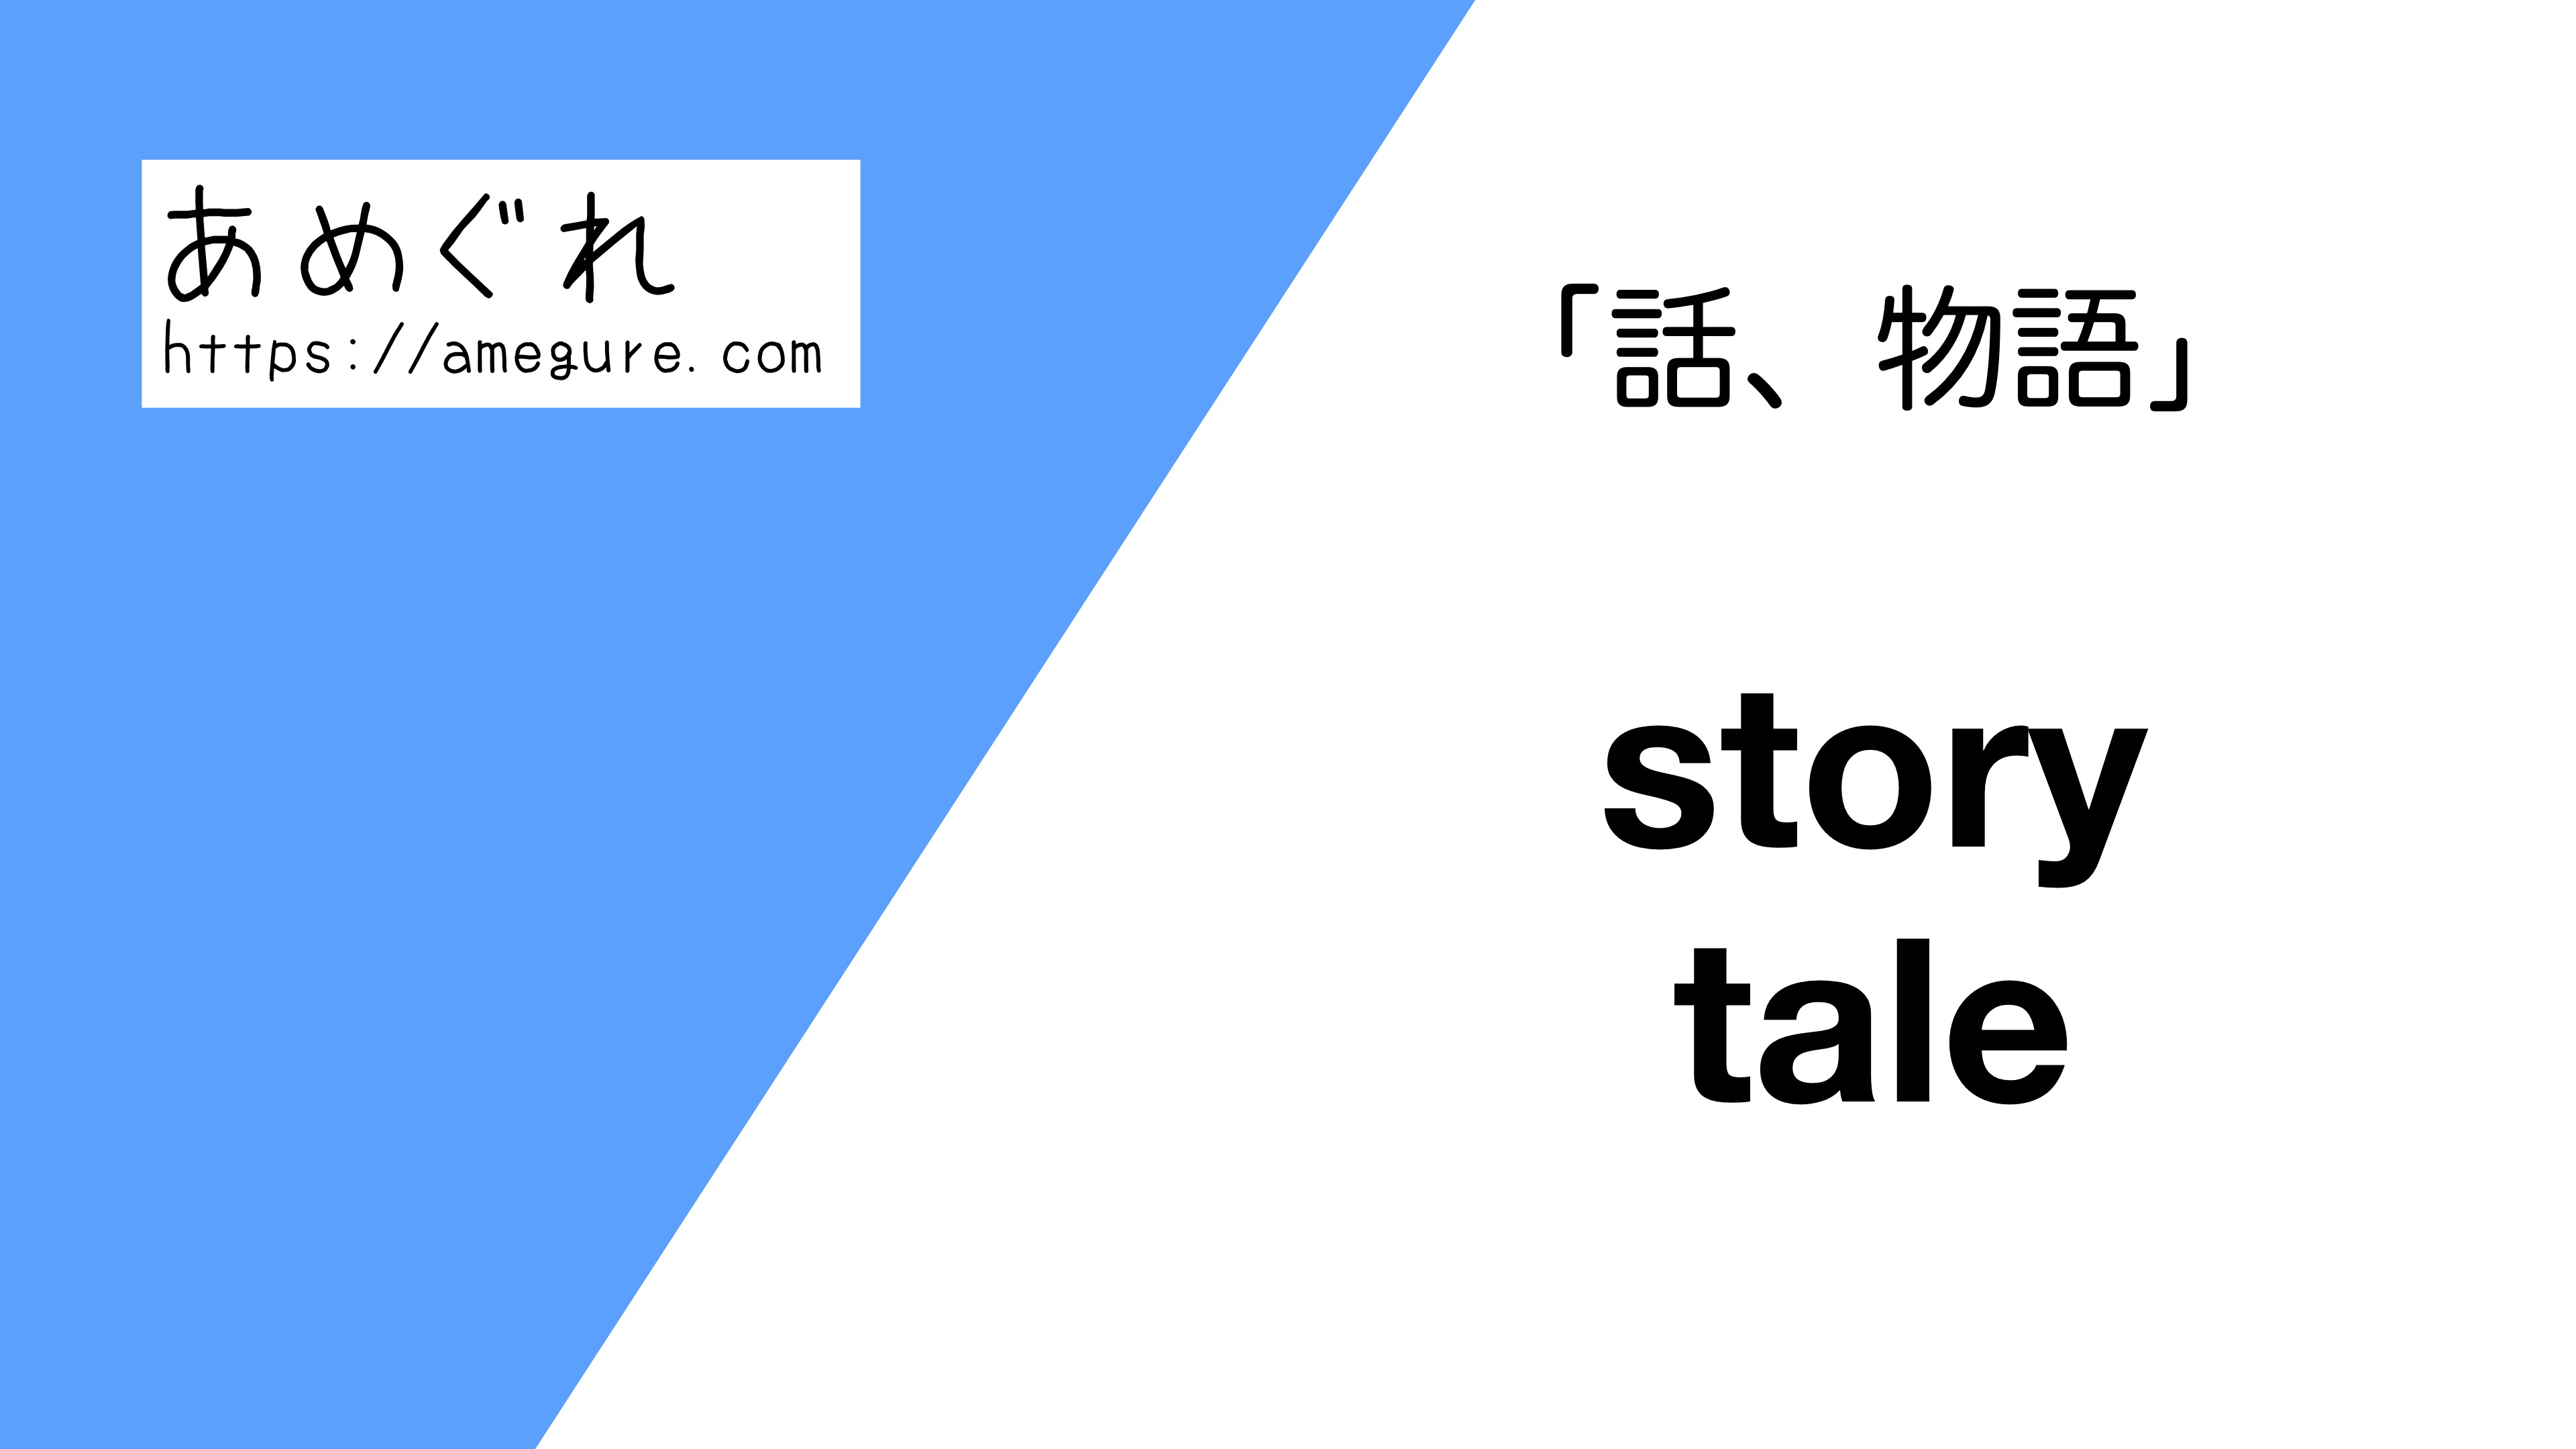 story-tale違い